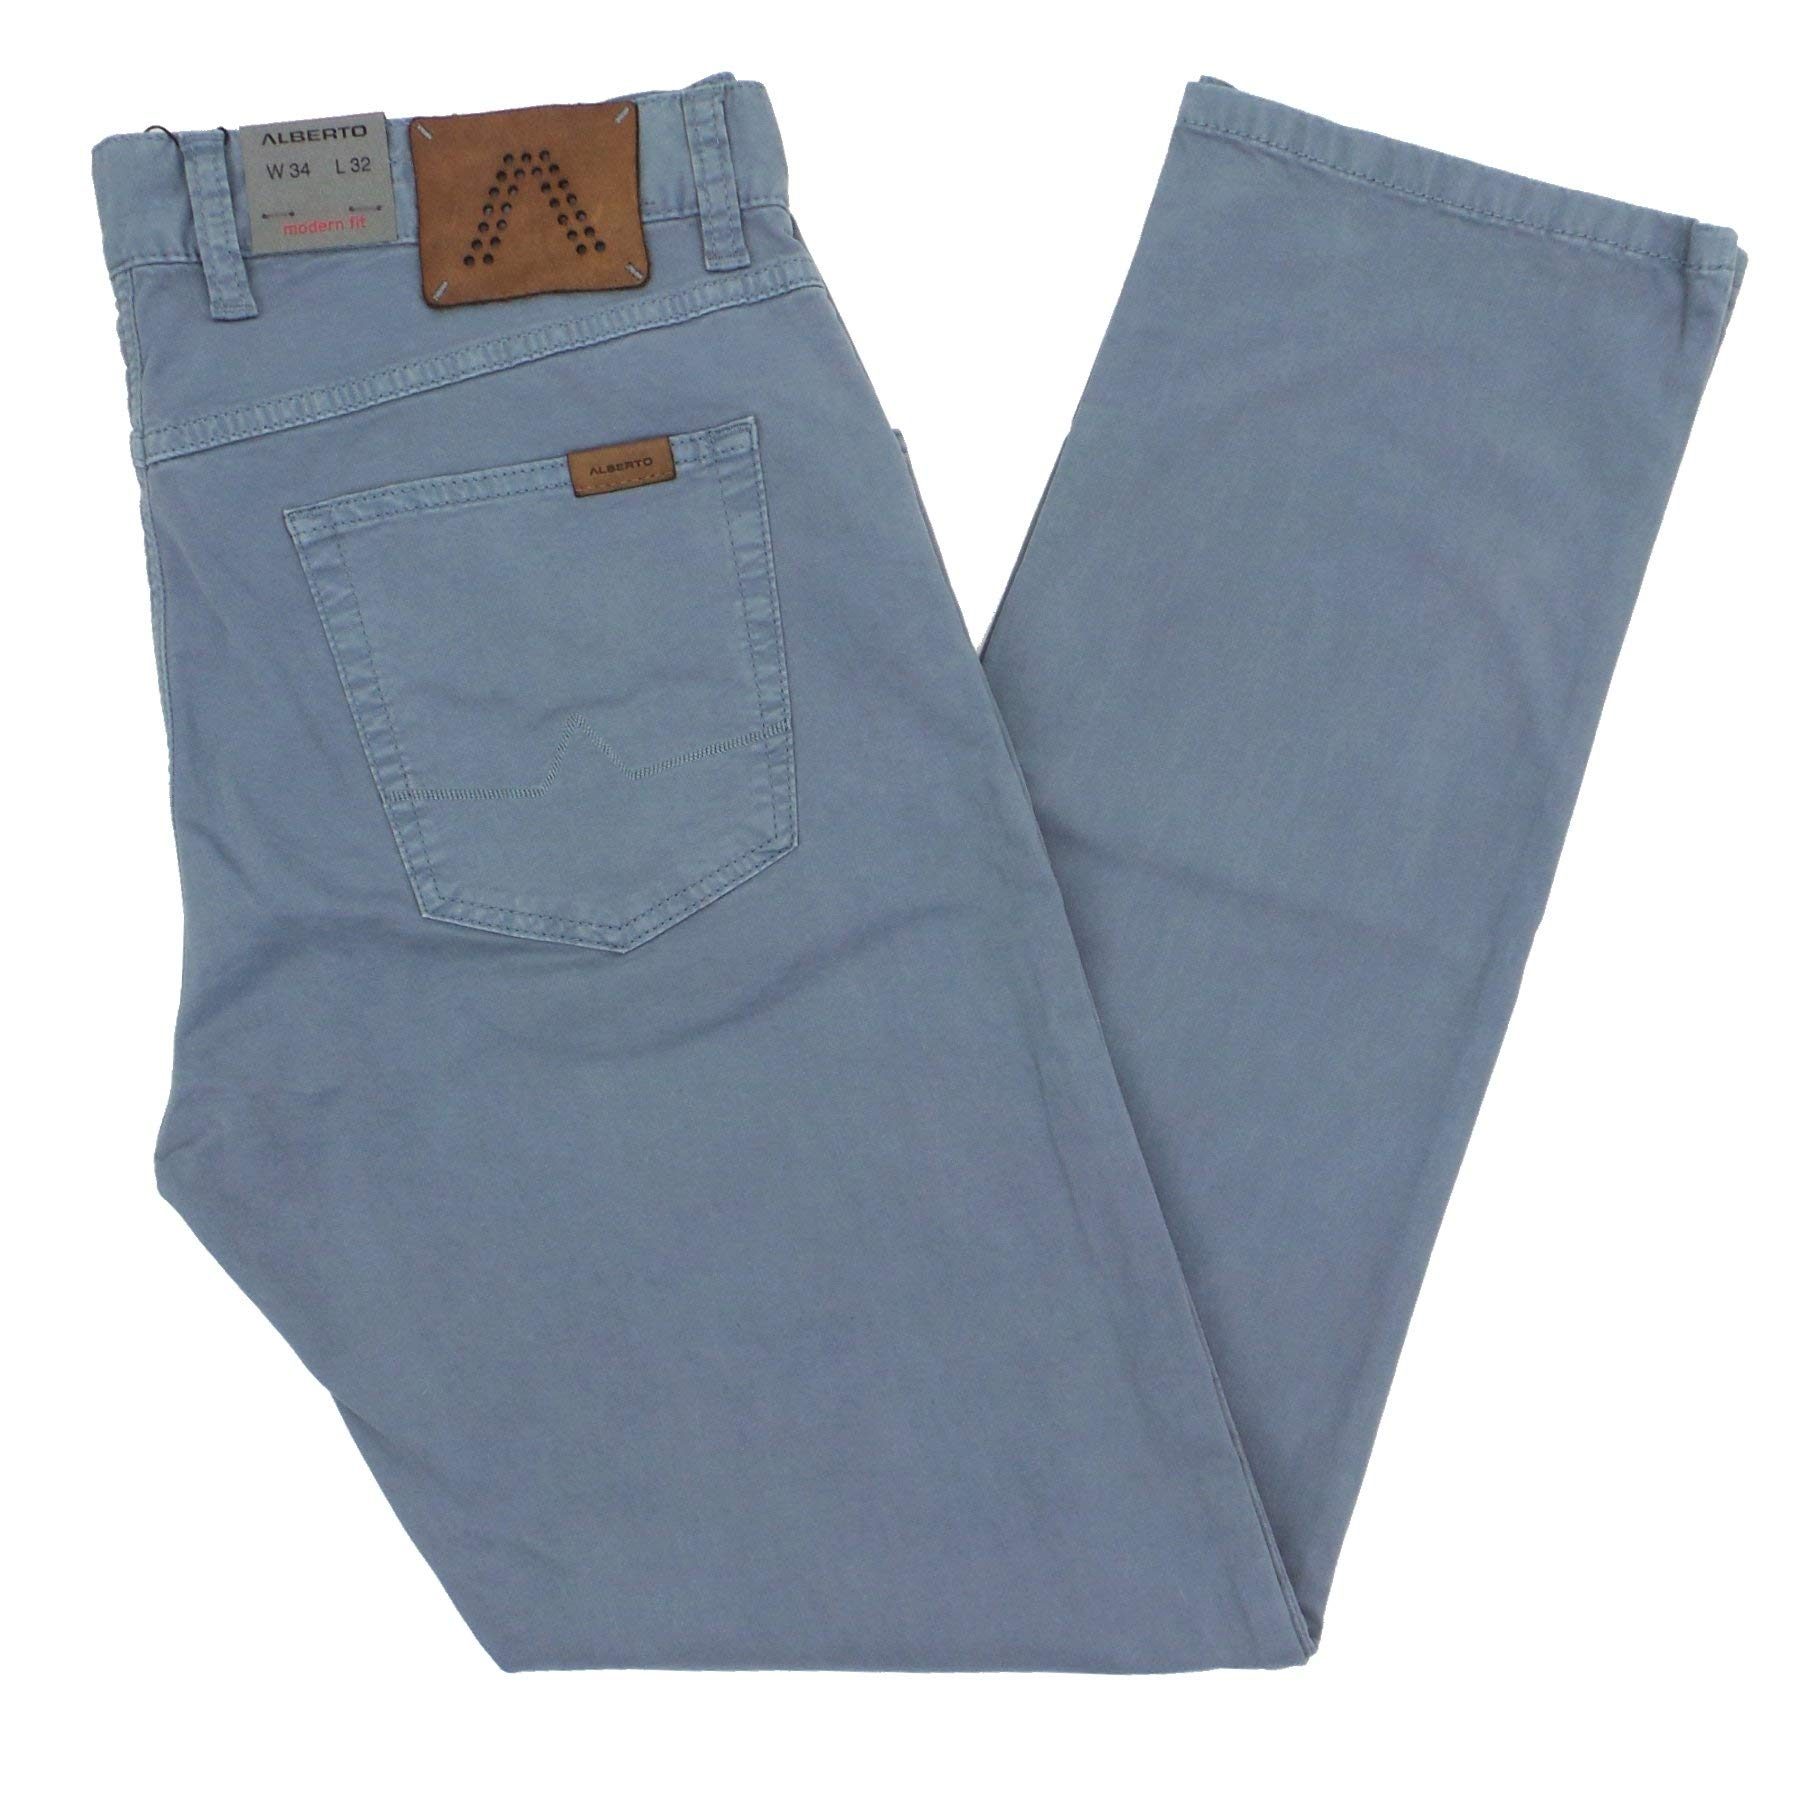 Alberto Stone 1703 Modern Fit Broken Twill Dynamic Superfit Pants Light Blue